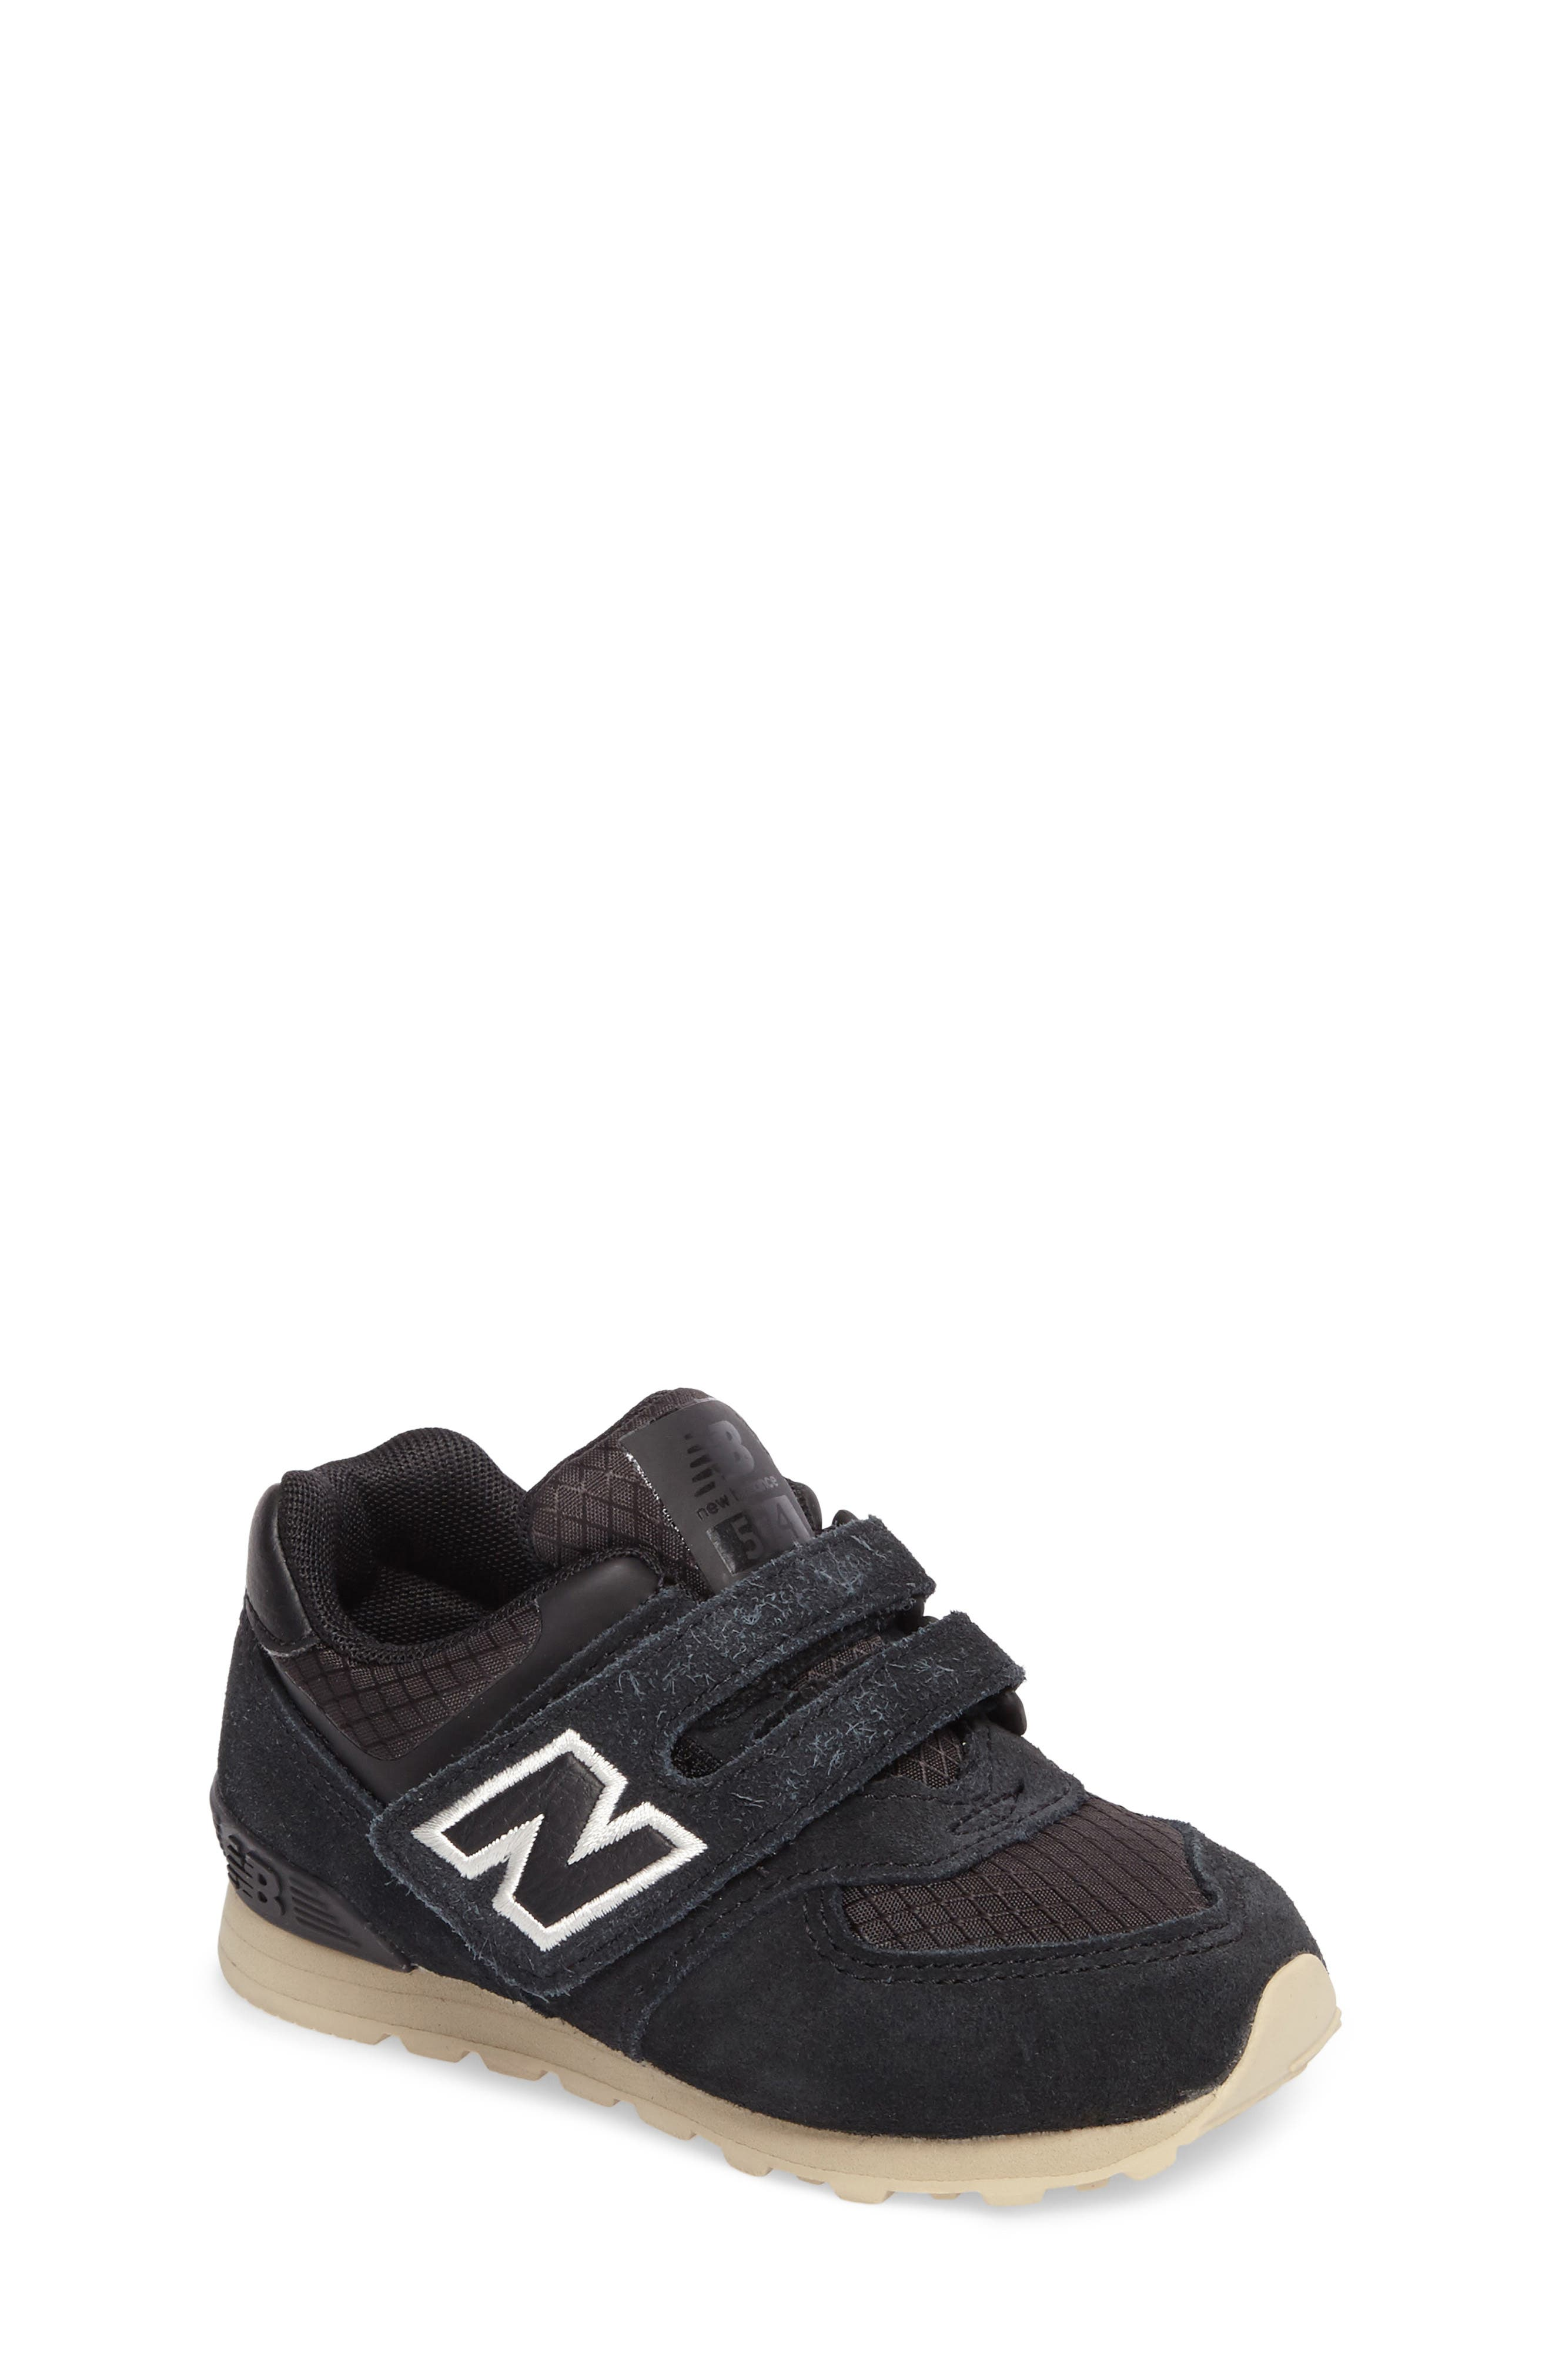 New Balance 574 Sneaker (Baby, Walker, Toddler, Little Kid & Big Kid)